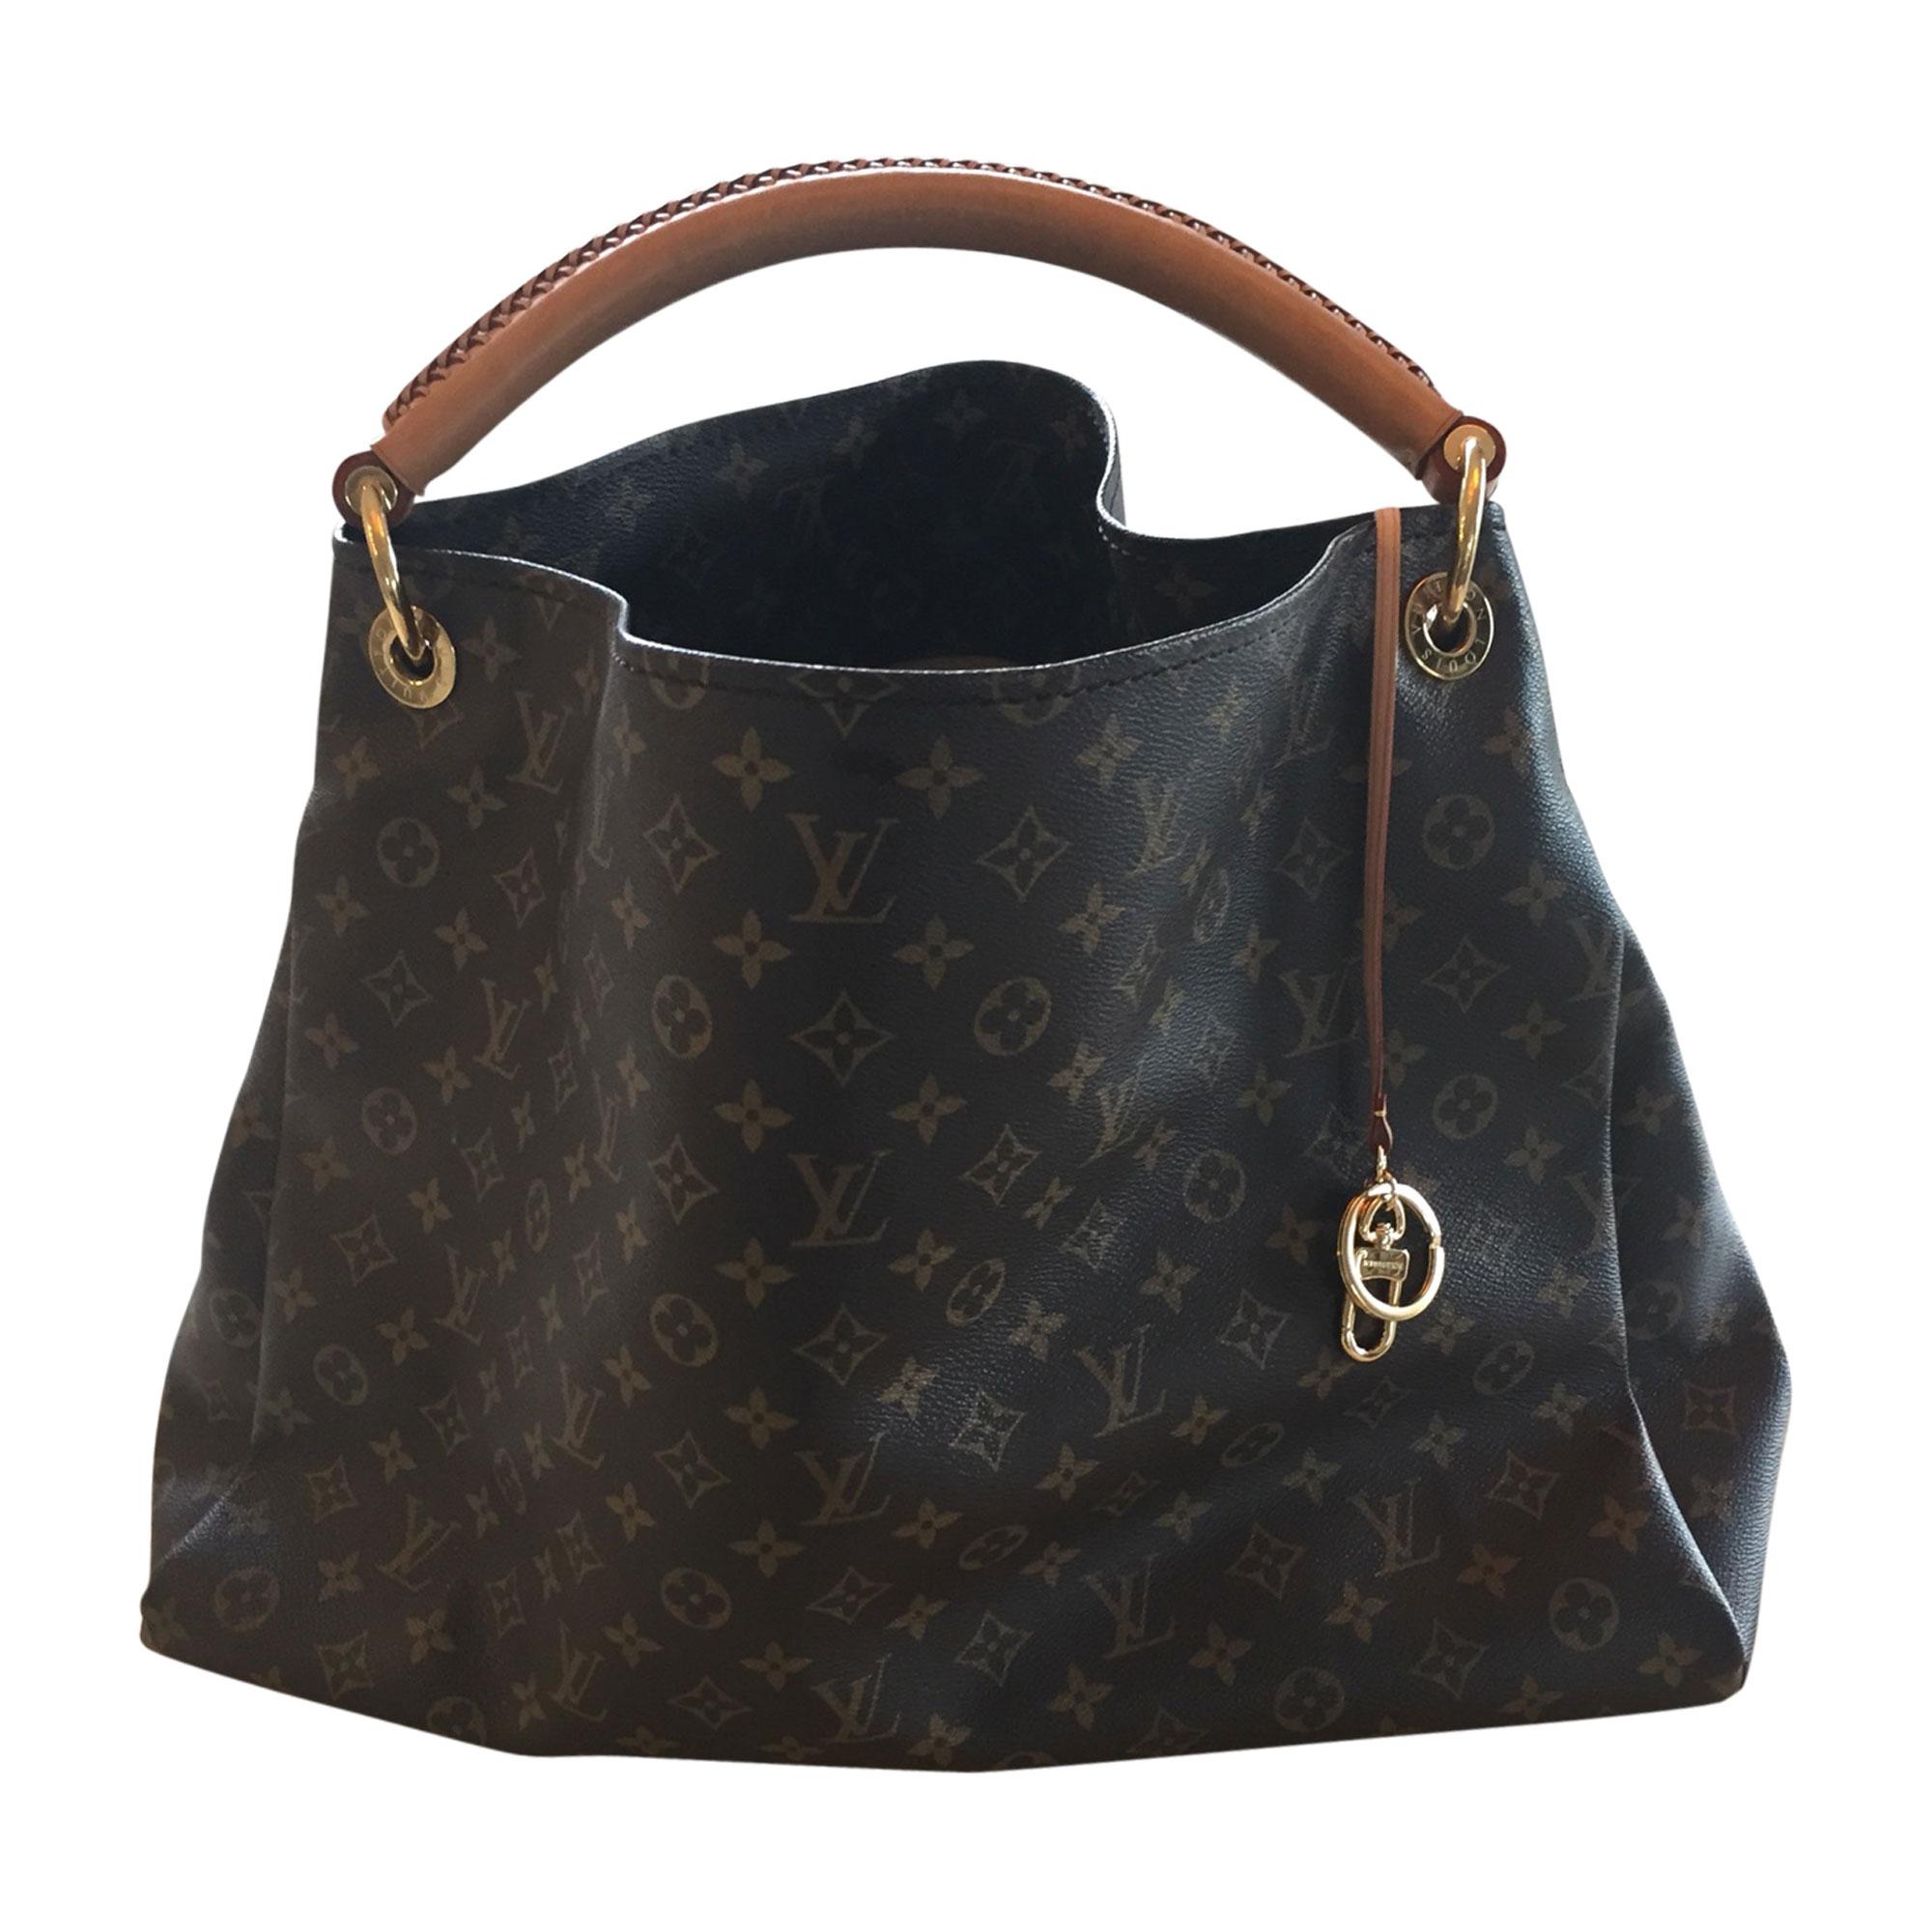 d9c650792ba Sac XL en cuir LOUIS VUITTON artsy marron vendu par Melanie 3783 ...